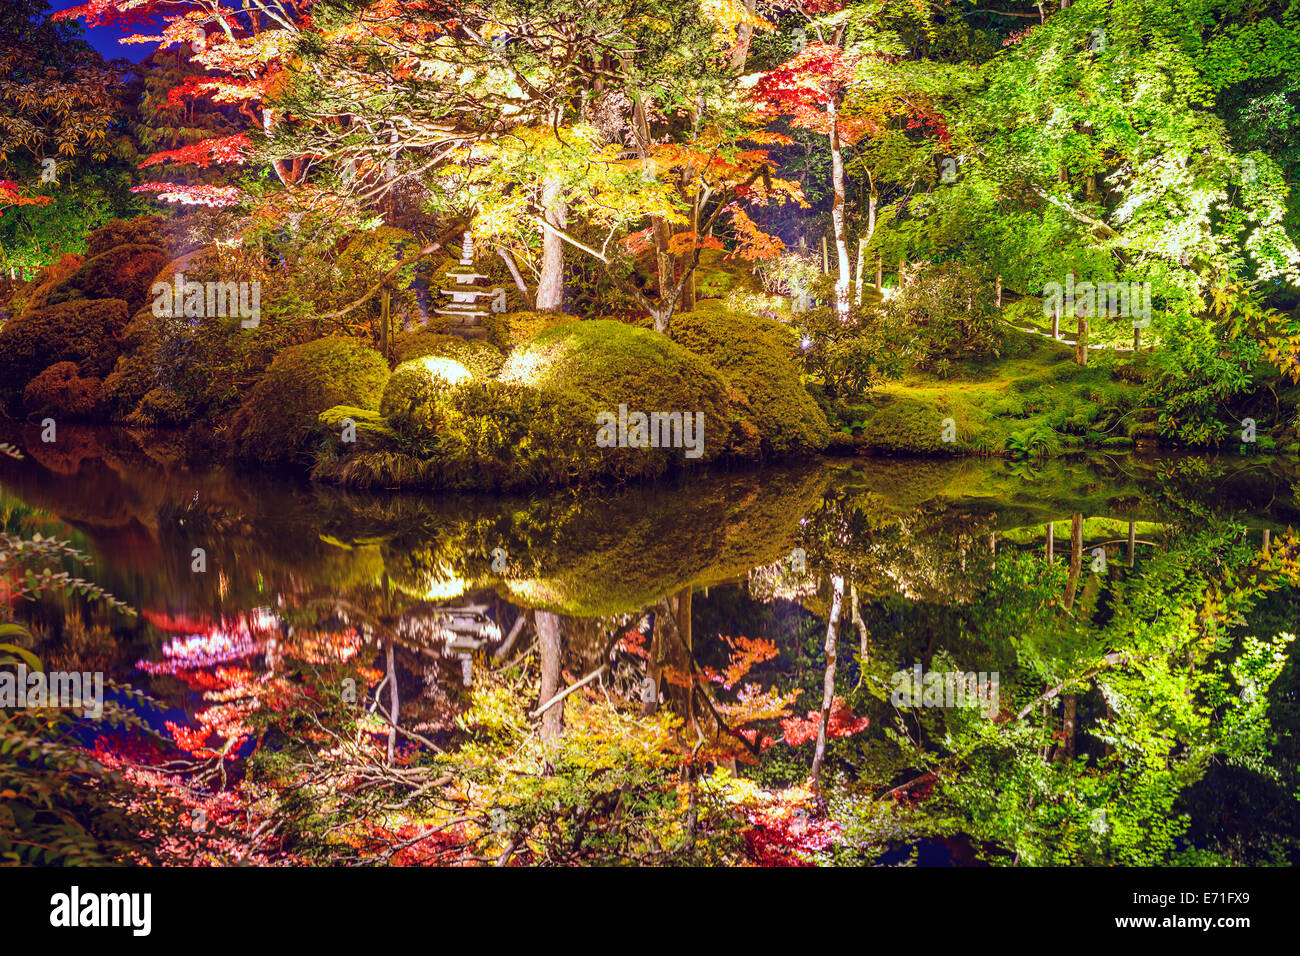 Nikko, Giappone a Shoyo-en giardino in autunno. Immagini Stock